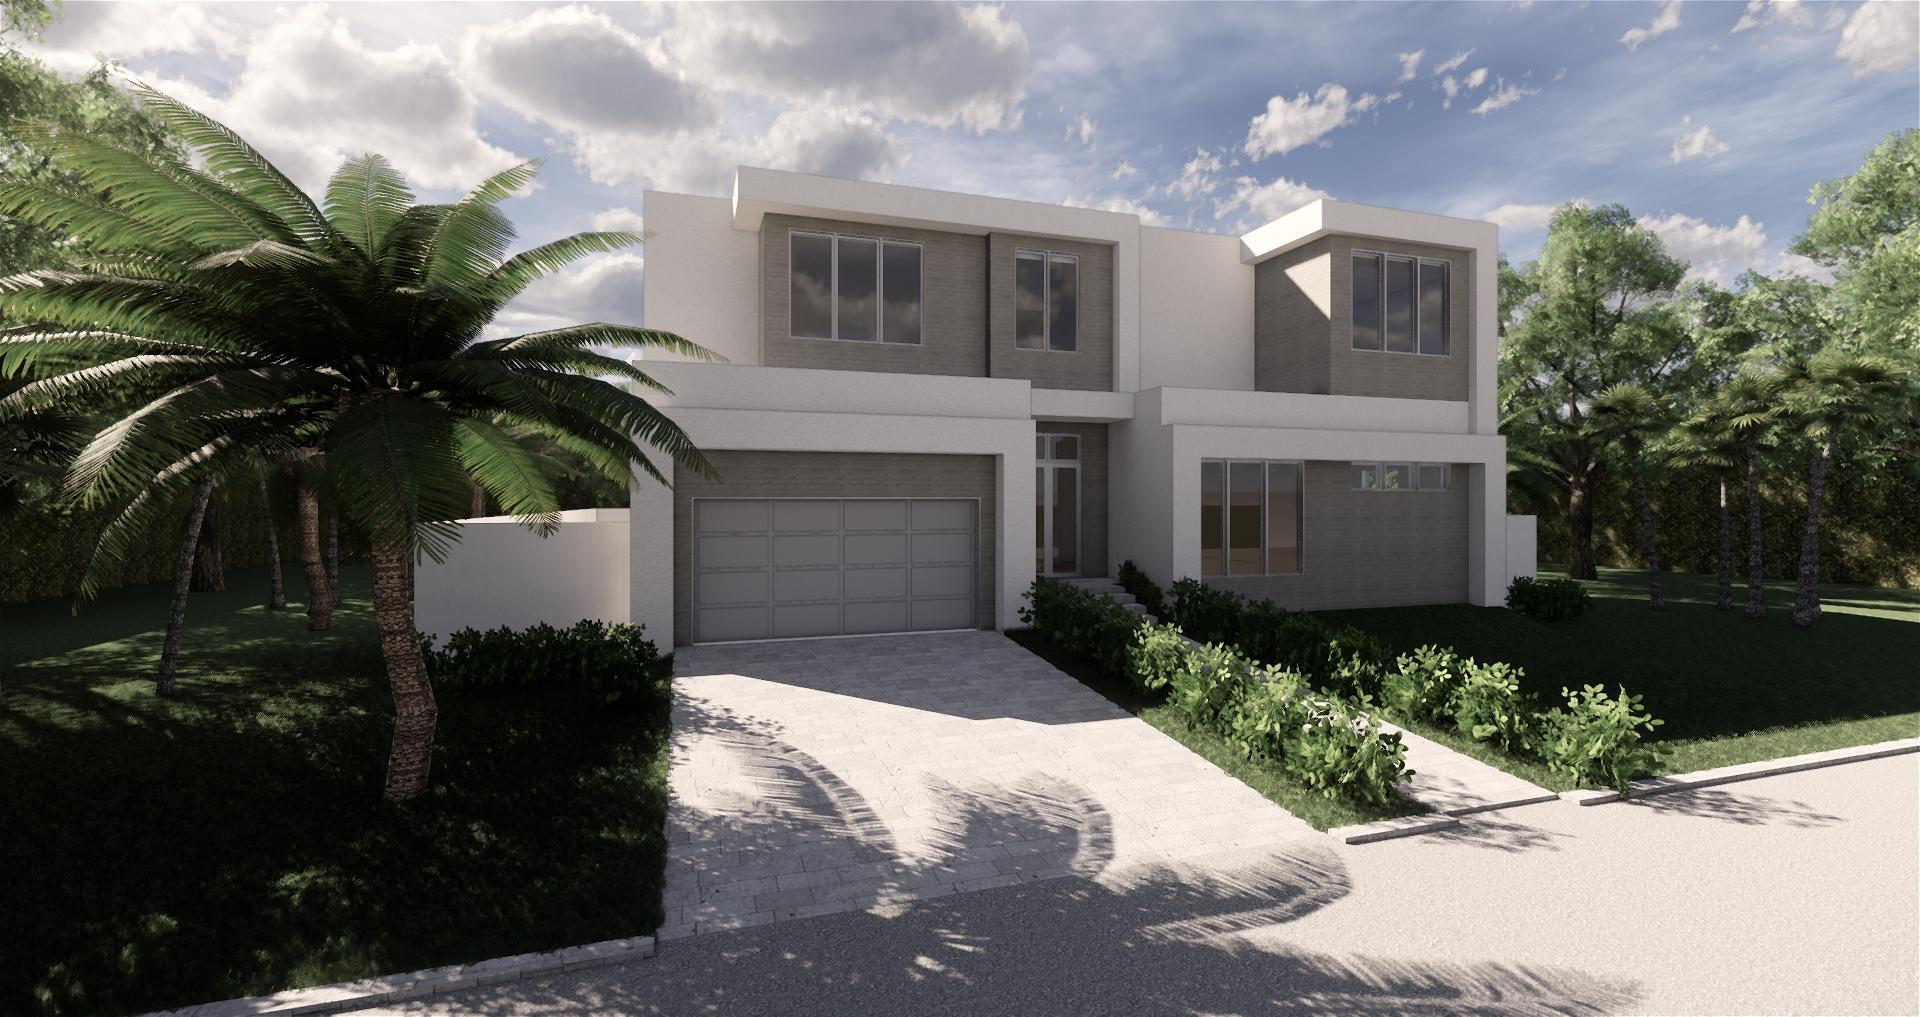 Details for 120 Summa Street, West Palm Beach, FL 33405